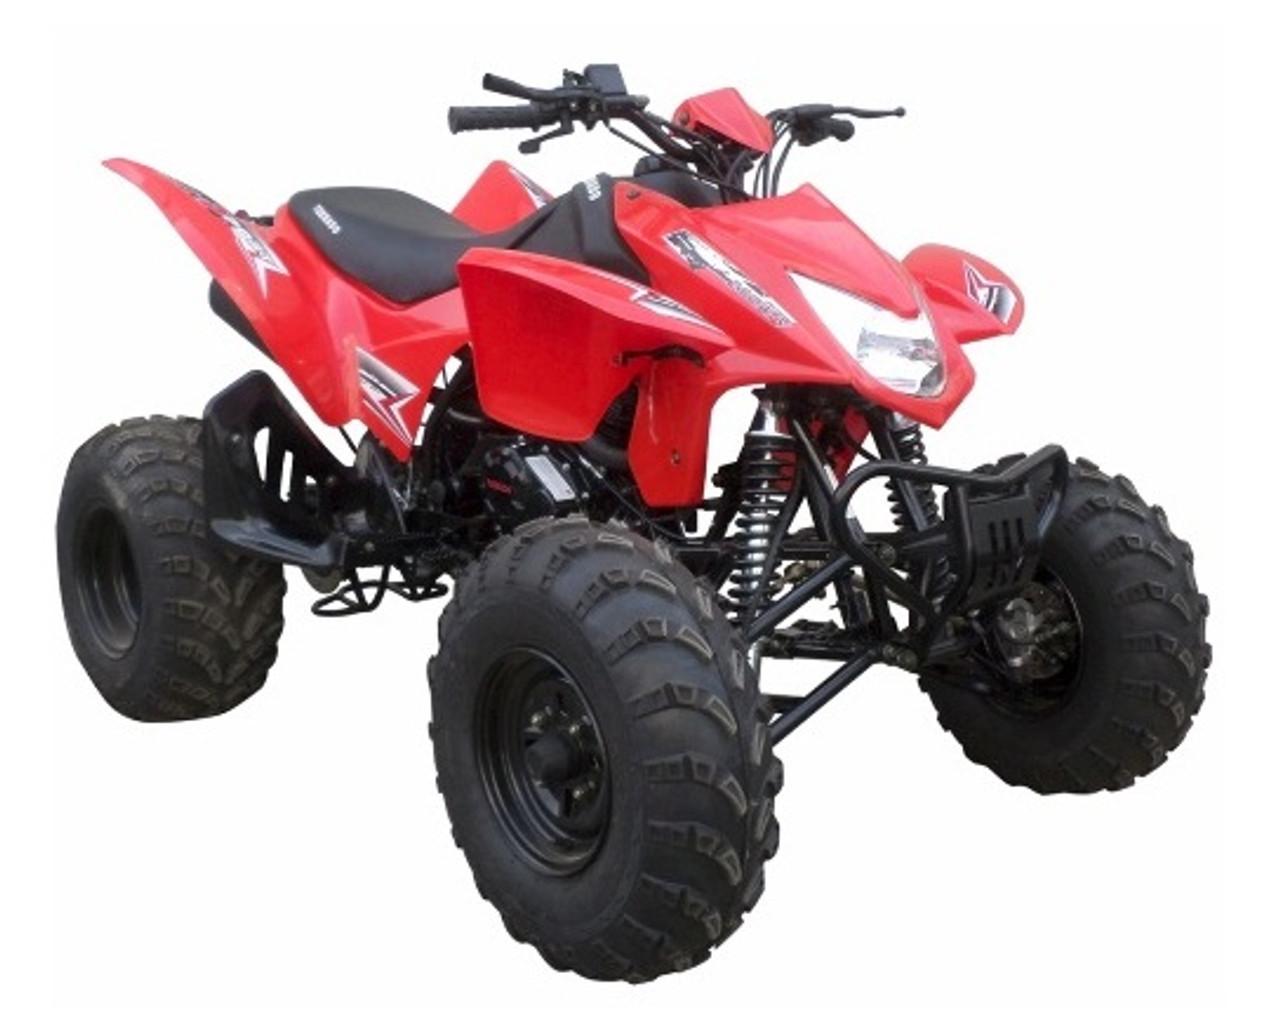 RPS NEW ATV 250 CC TORNADO 4-speed plus neutral/reverse